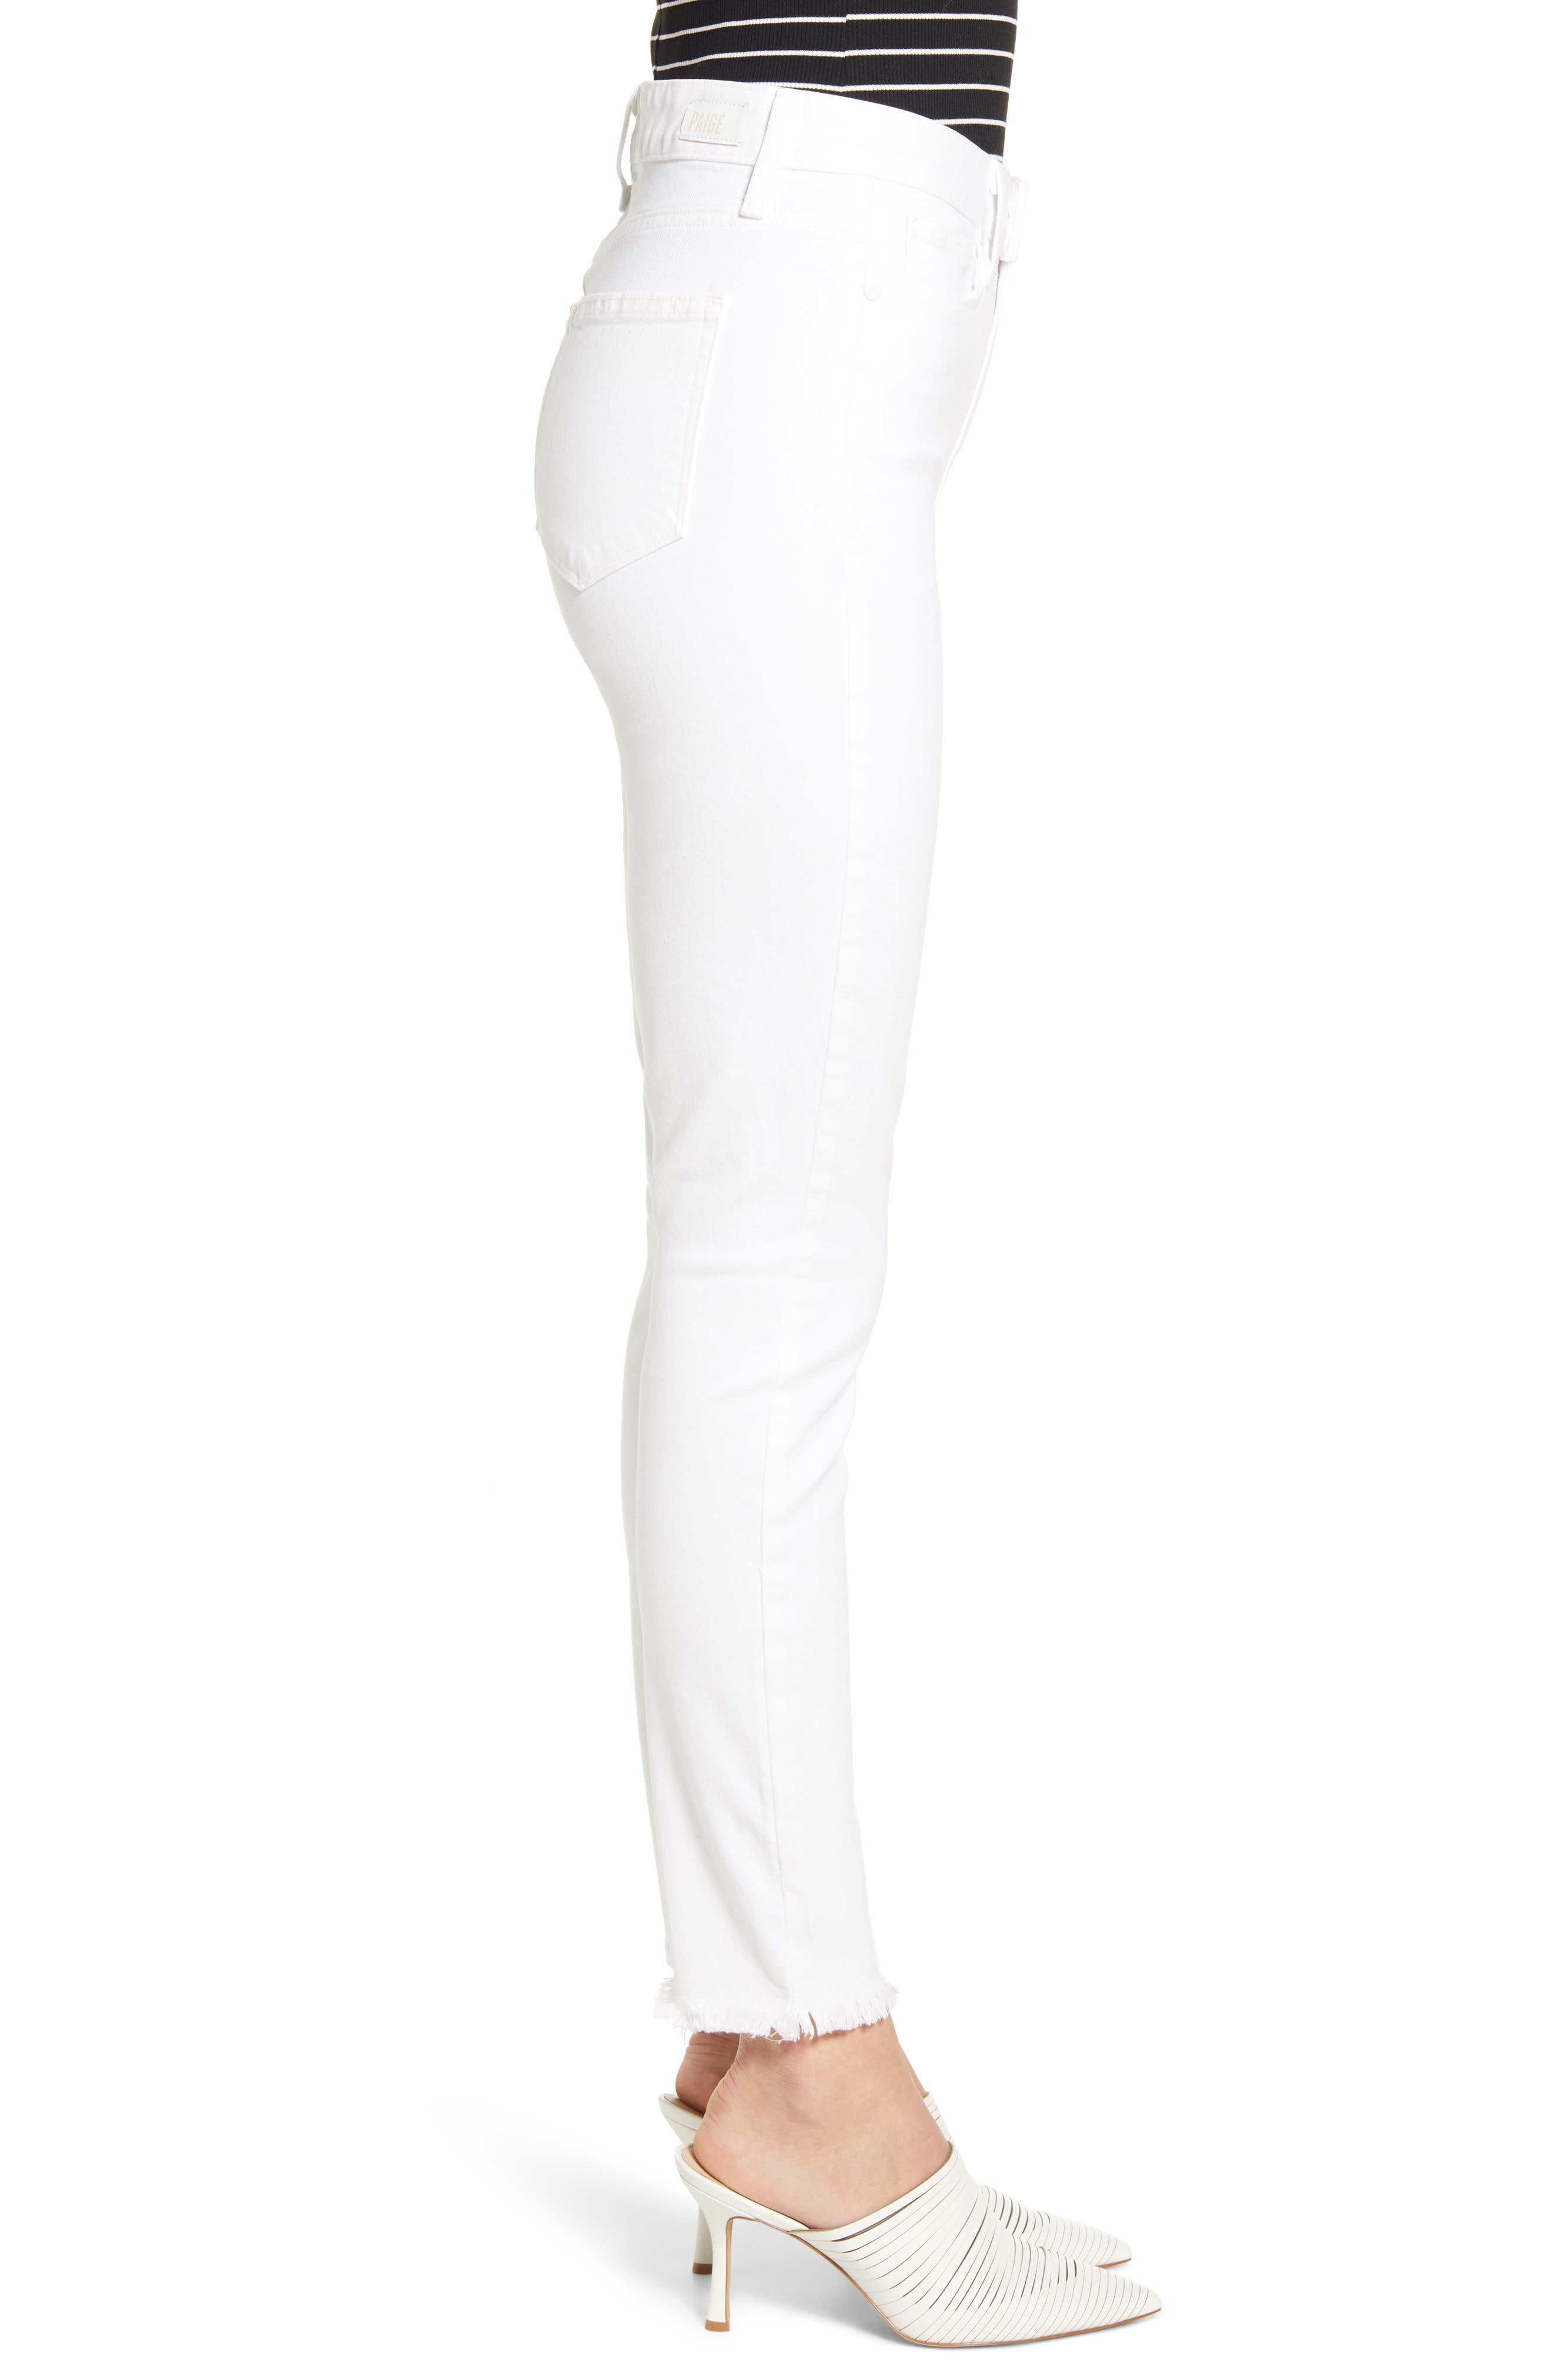 PAIGE, Hoxton High Waist Ankle Skinny Jeans, Alternate thumbnail 4, color, CRISP WHITE